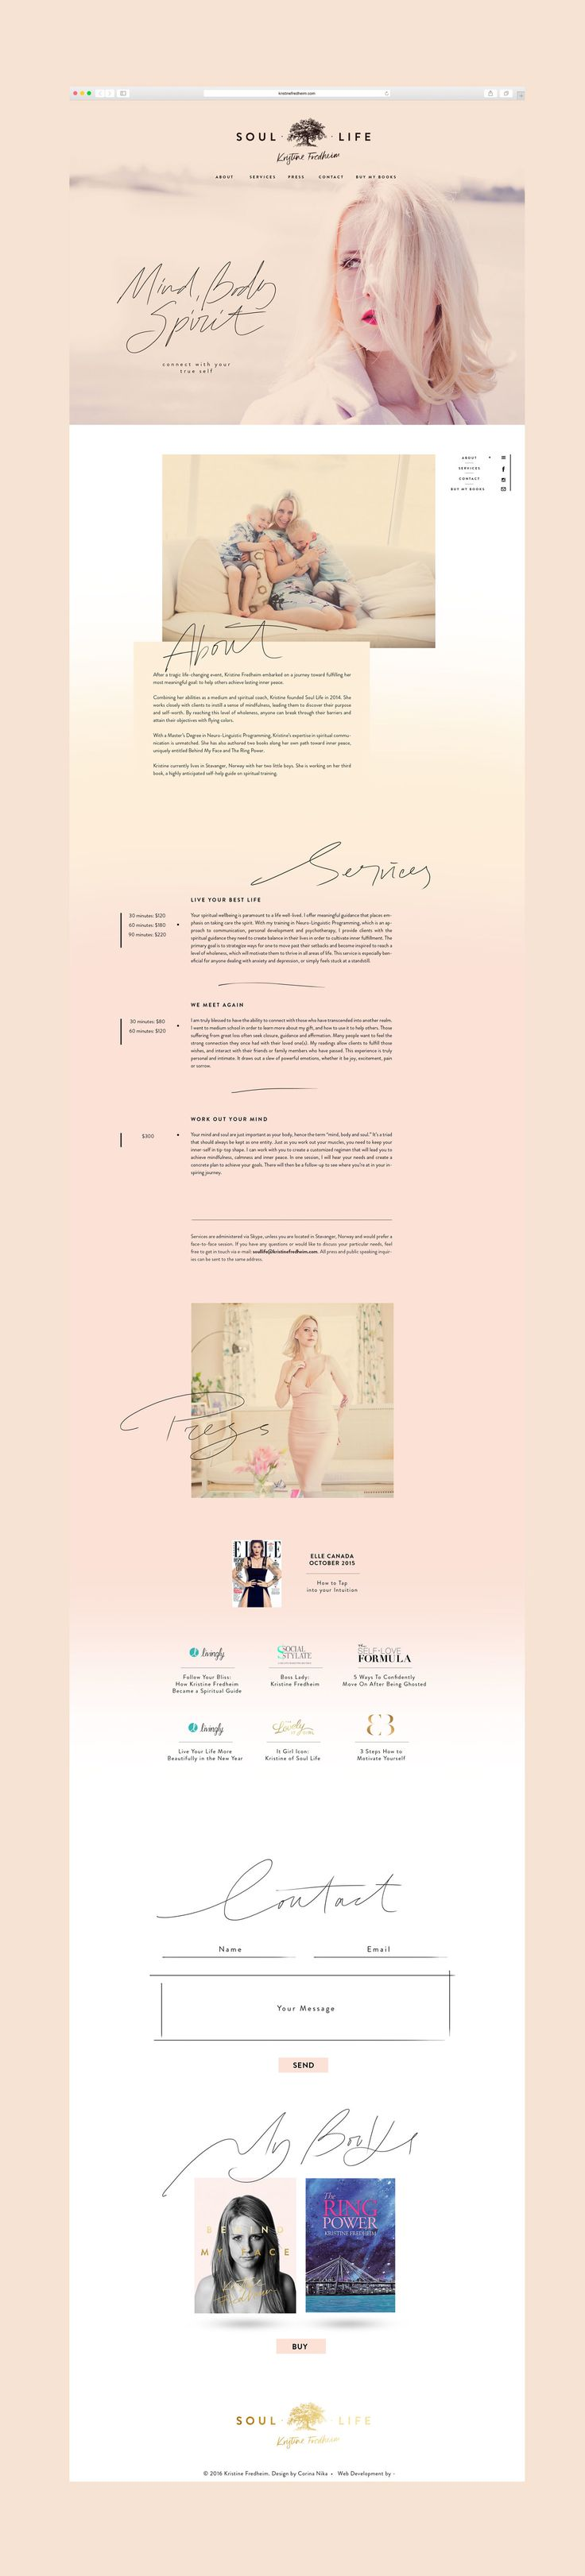 Kristine Fredheim Website - Cocorrina by Corina Nika